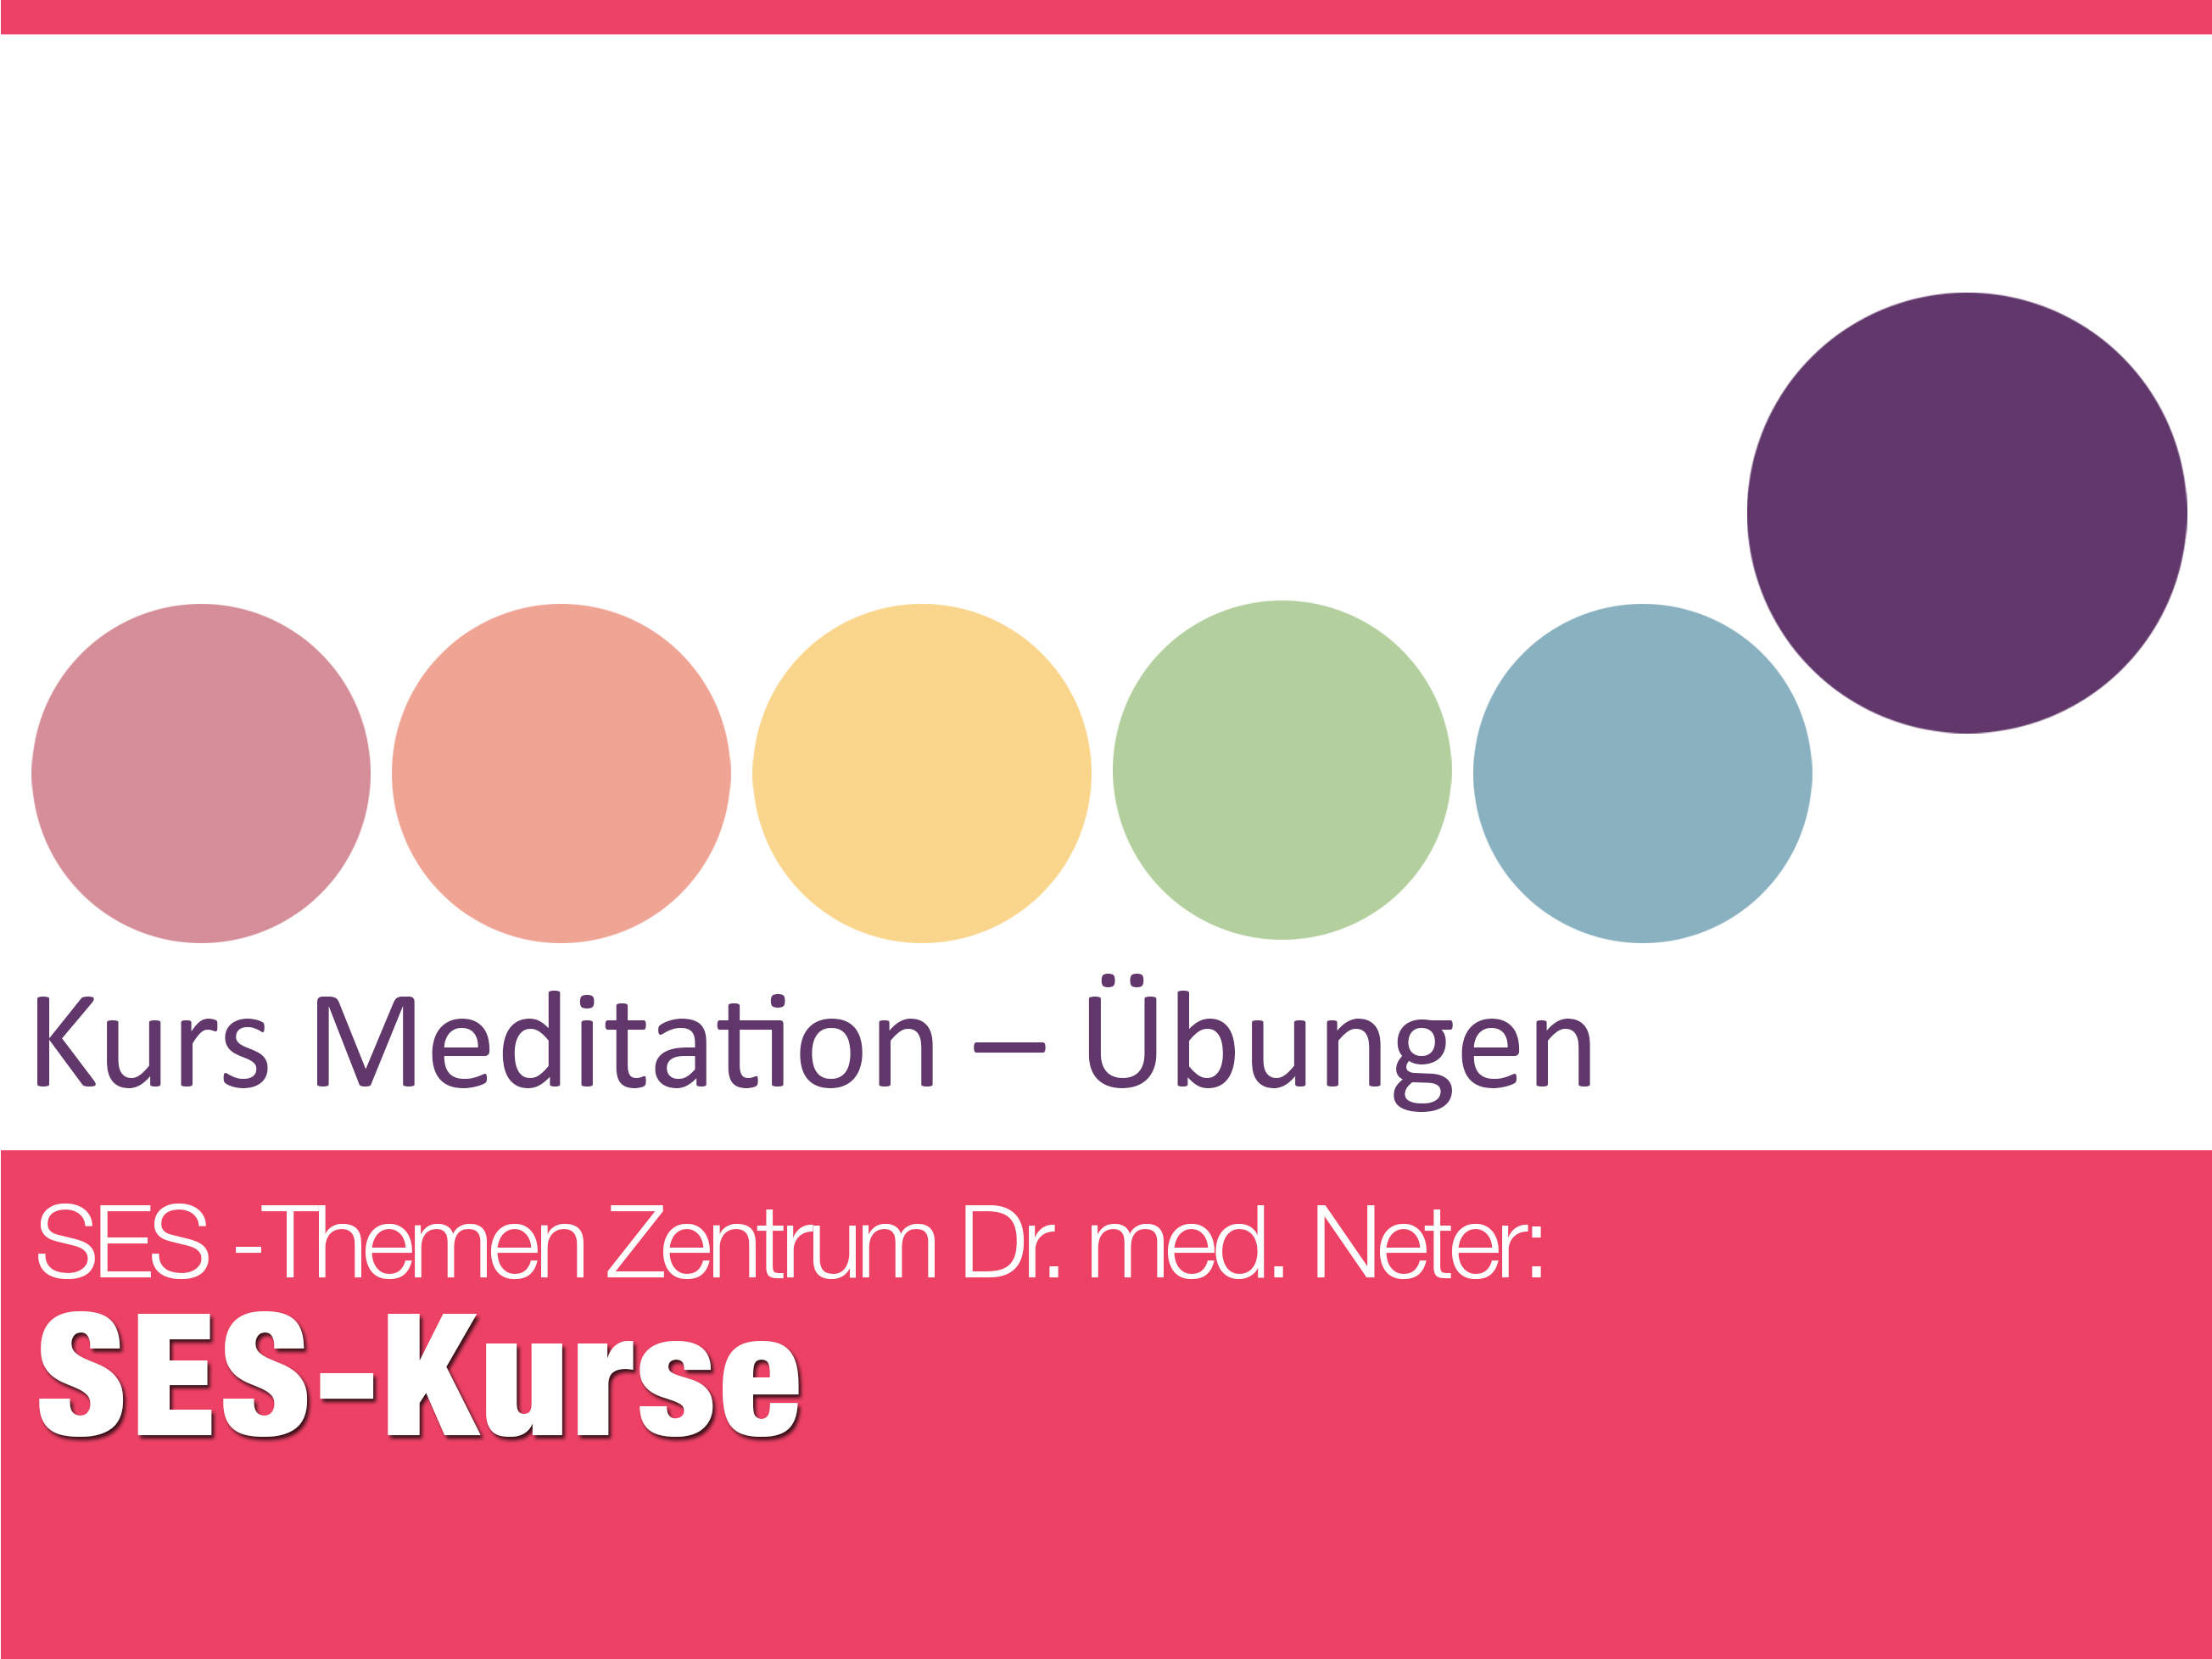 151110_SES_Kurs_Meditation